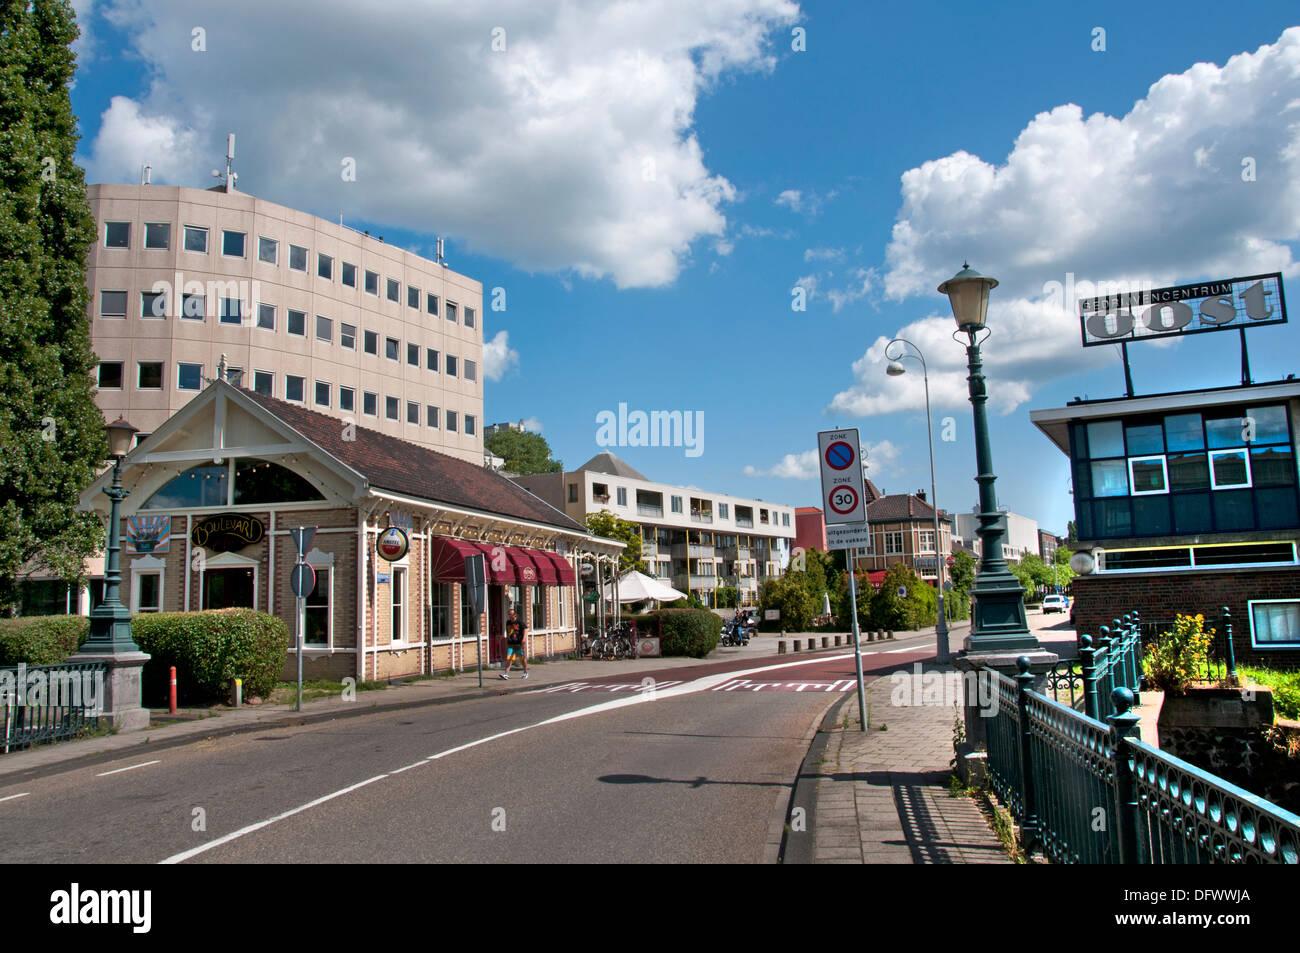 Restaurant Boulevar Amsterdam Zeeburg Netherlands Dutch modern city town - Stock Image